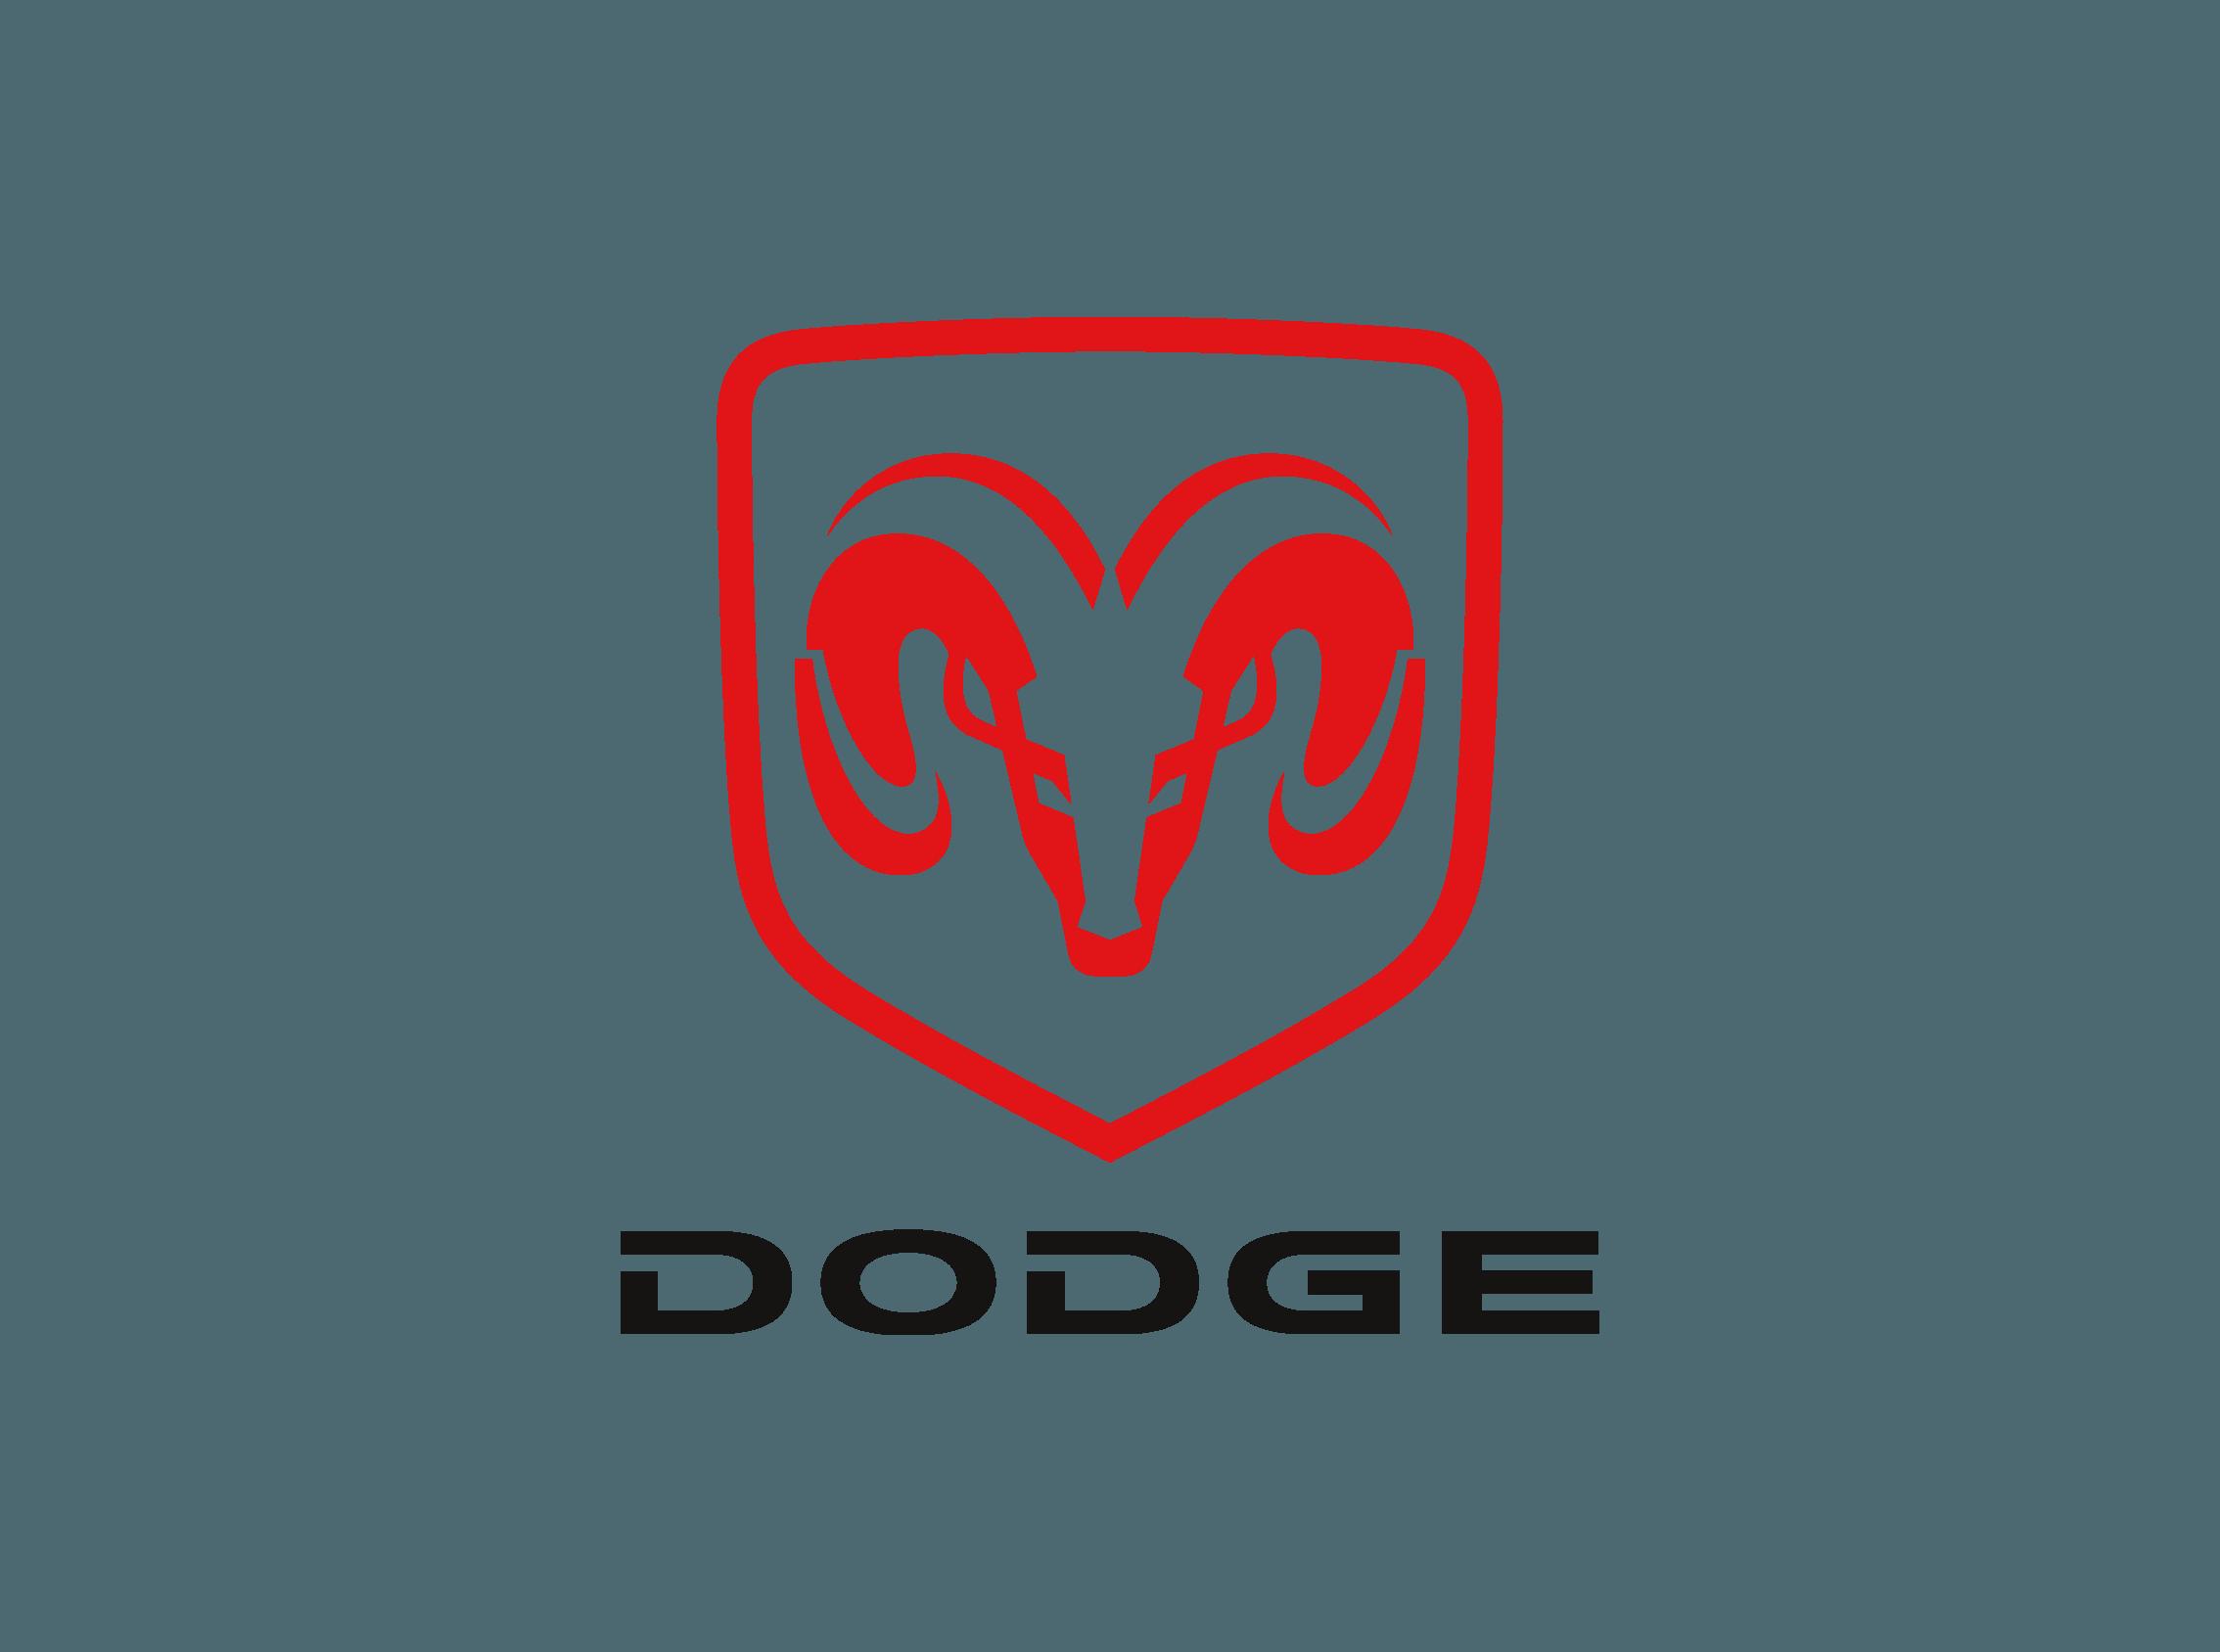 Dodge Ram Logo Png